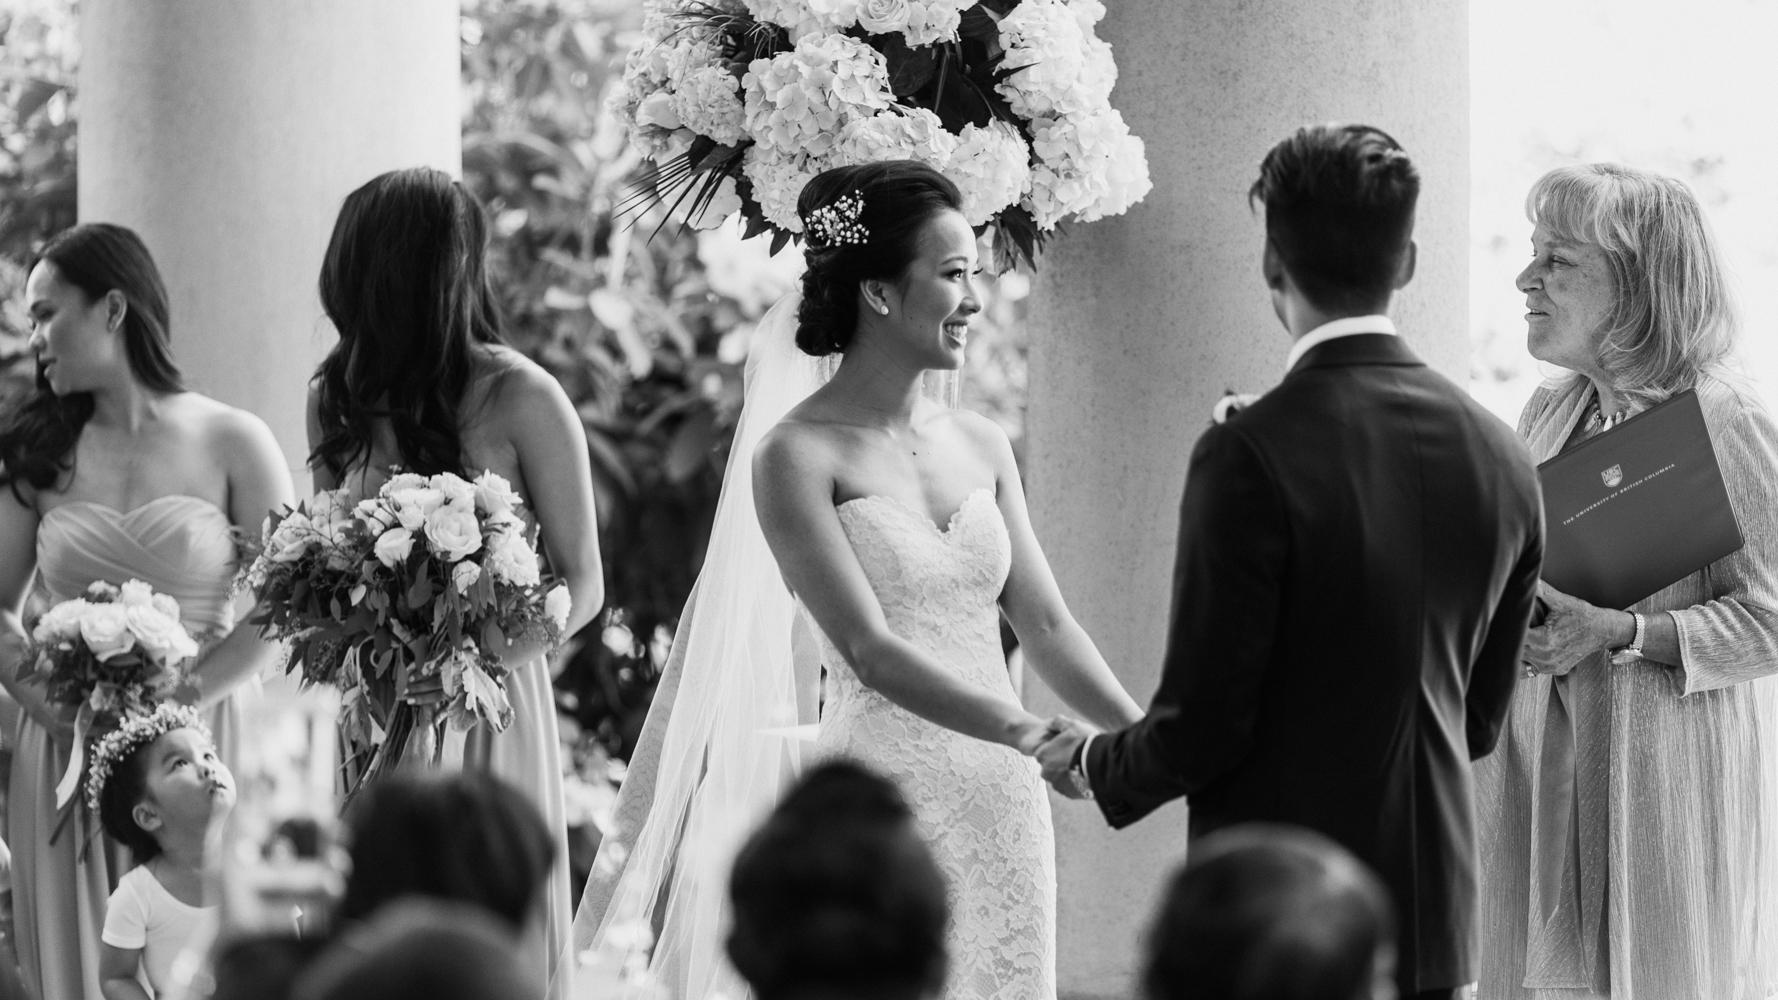 herafilms_wedding_lisa_arthur_hera_selects_web-32.jpg